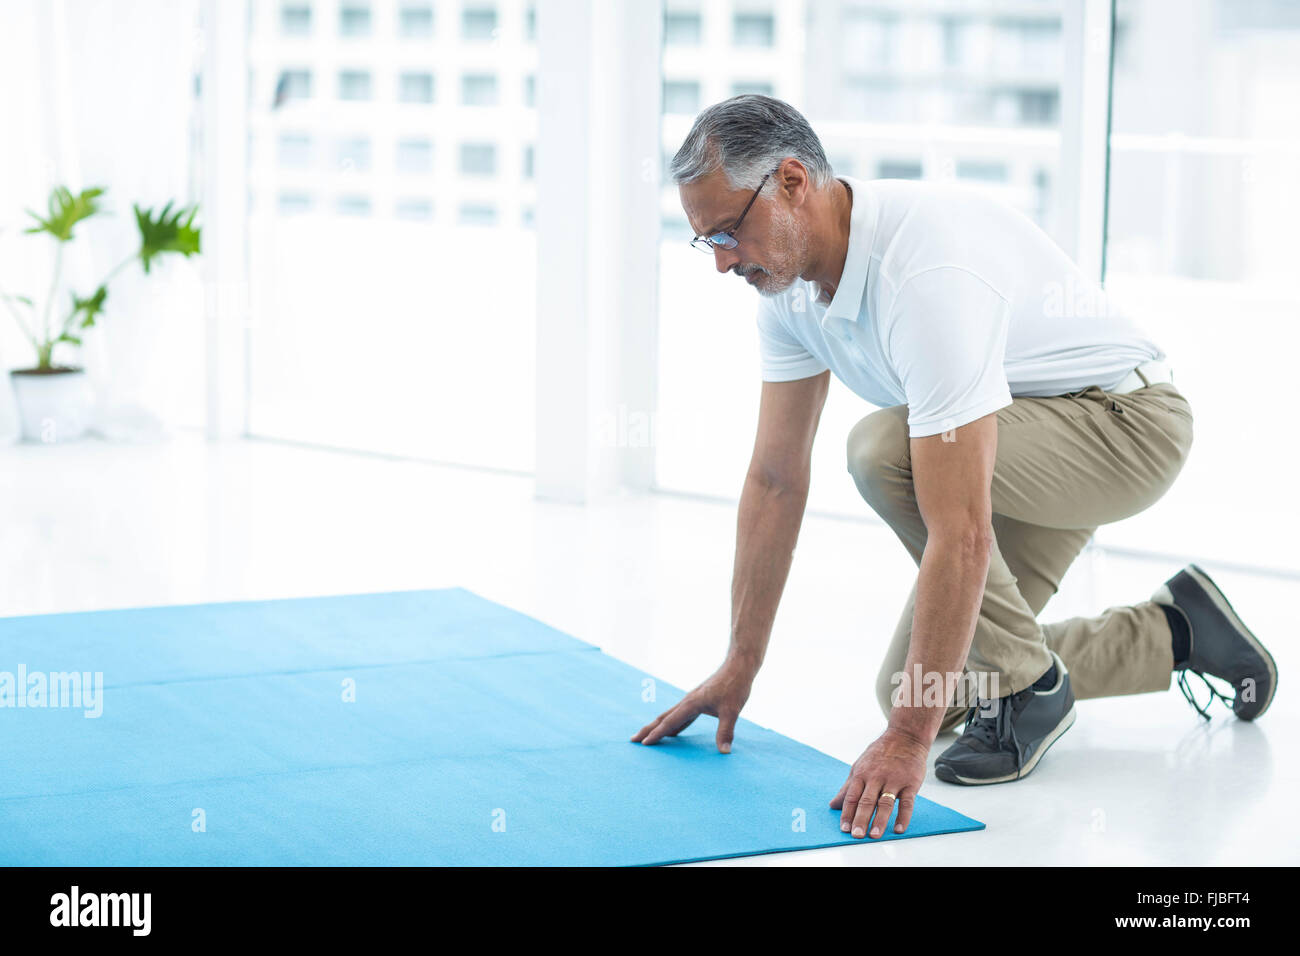 Physiotherapist laying exercise mat - Stock Image